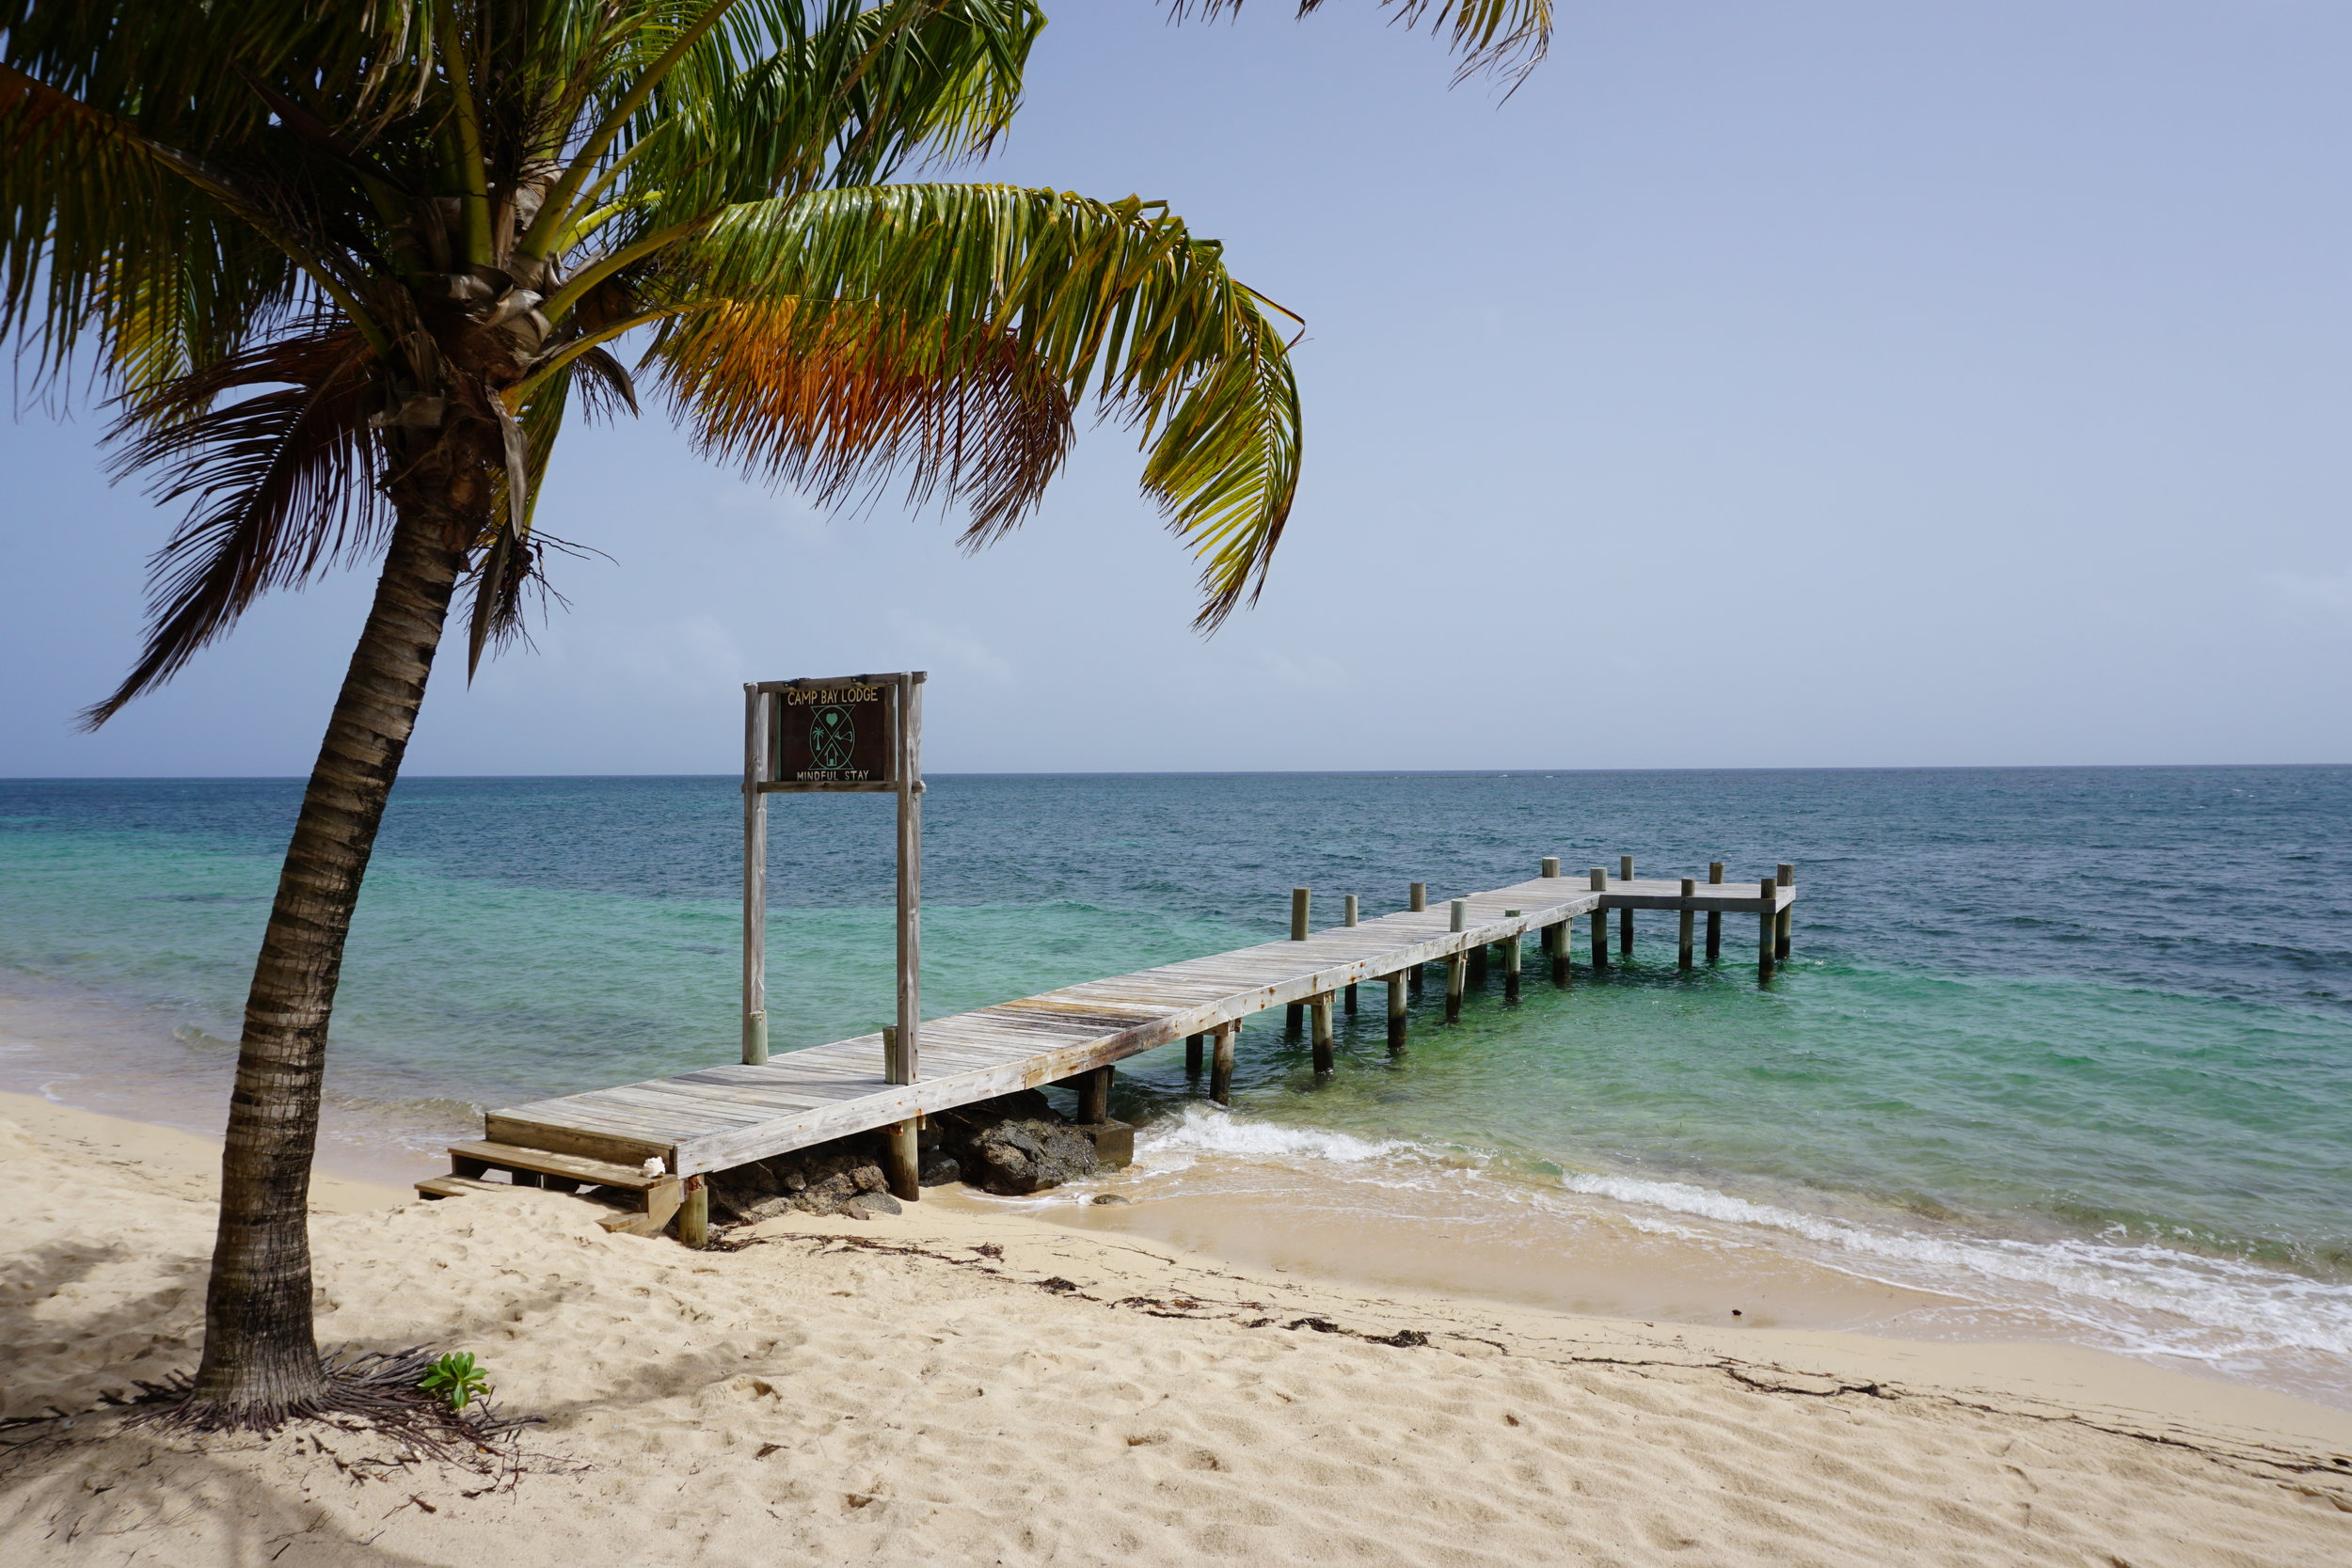 Camp Bay Lodge - Beach Resort with Kite Surfing | Roatan